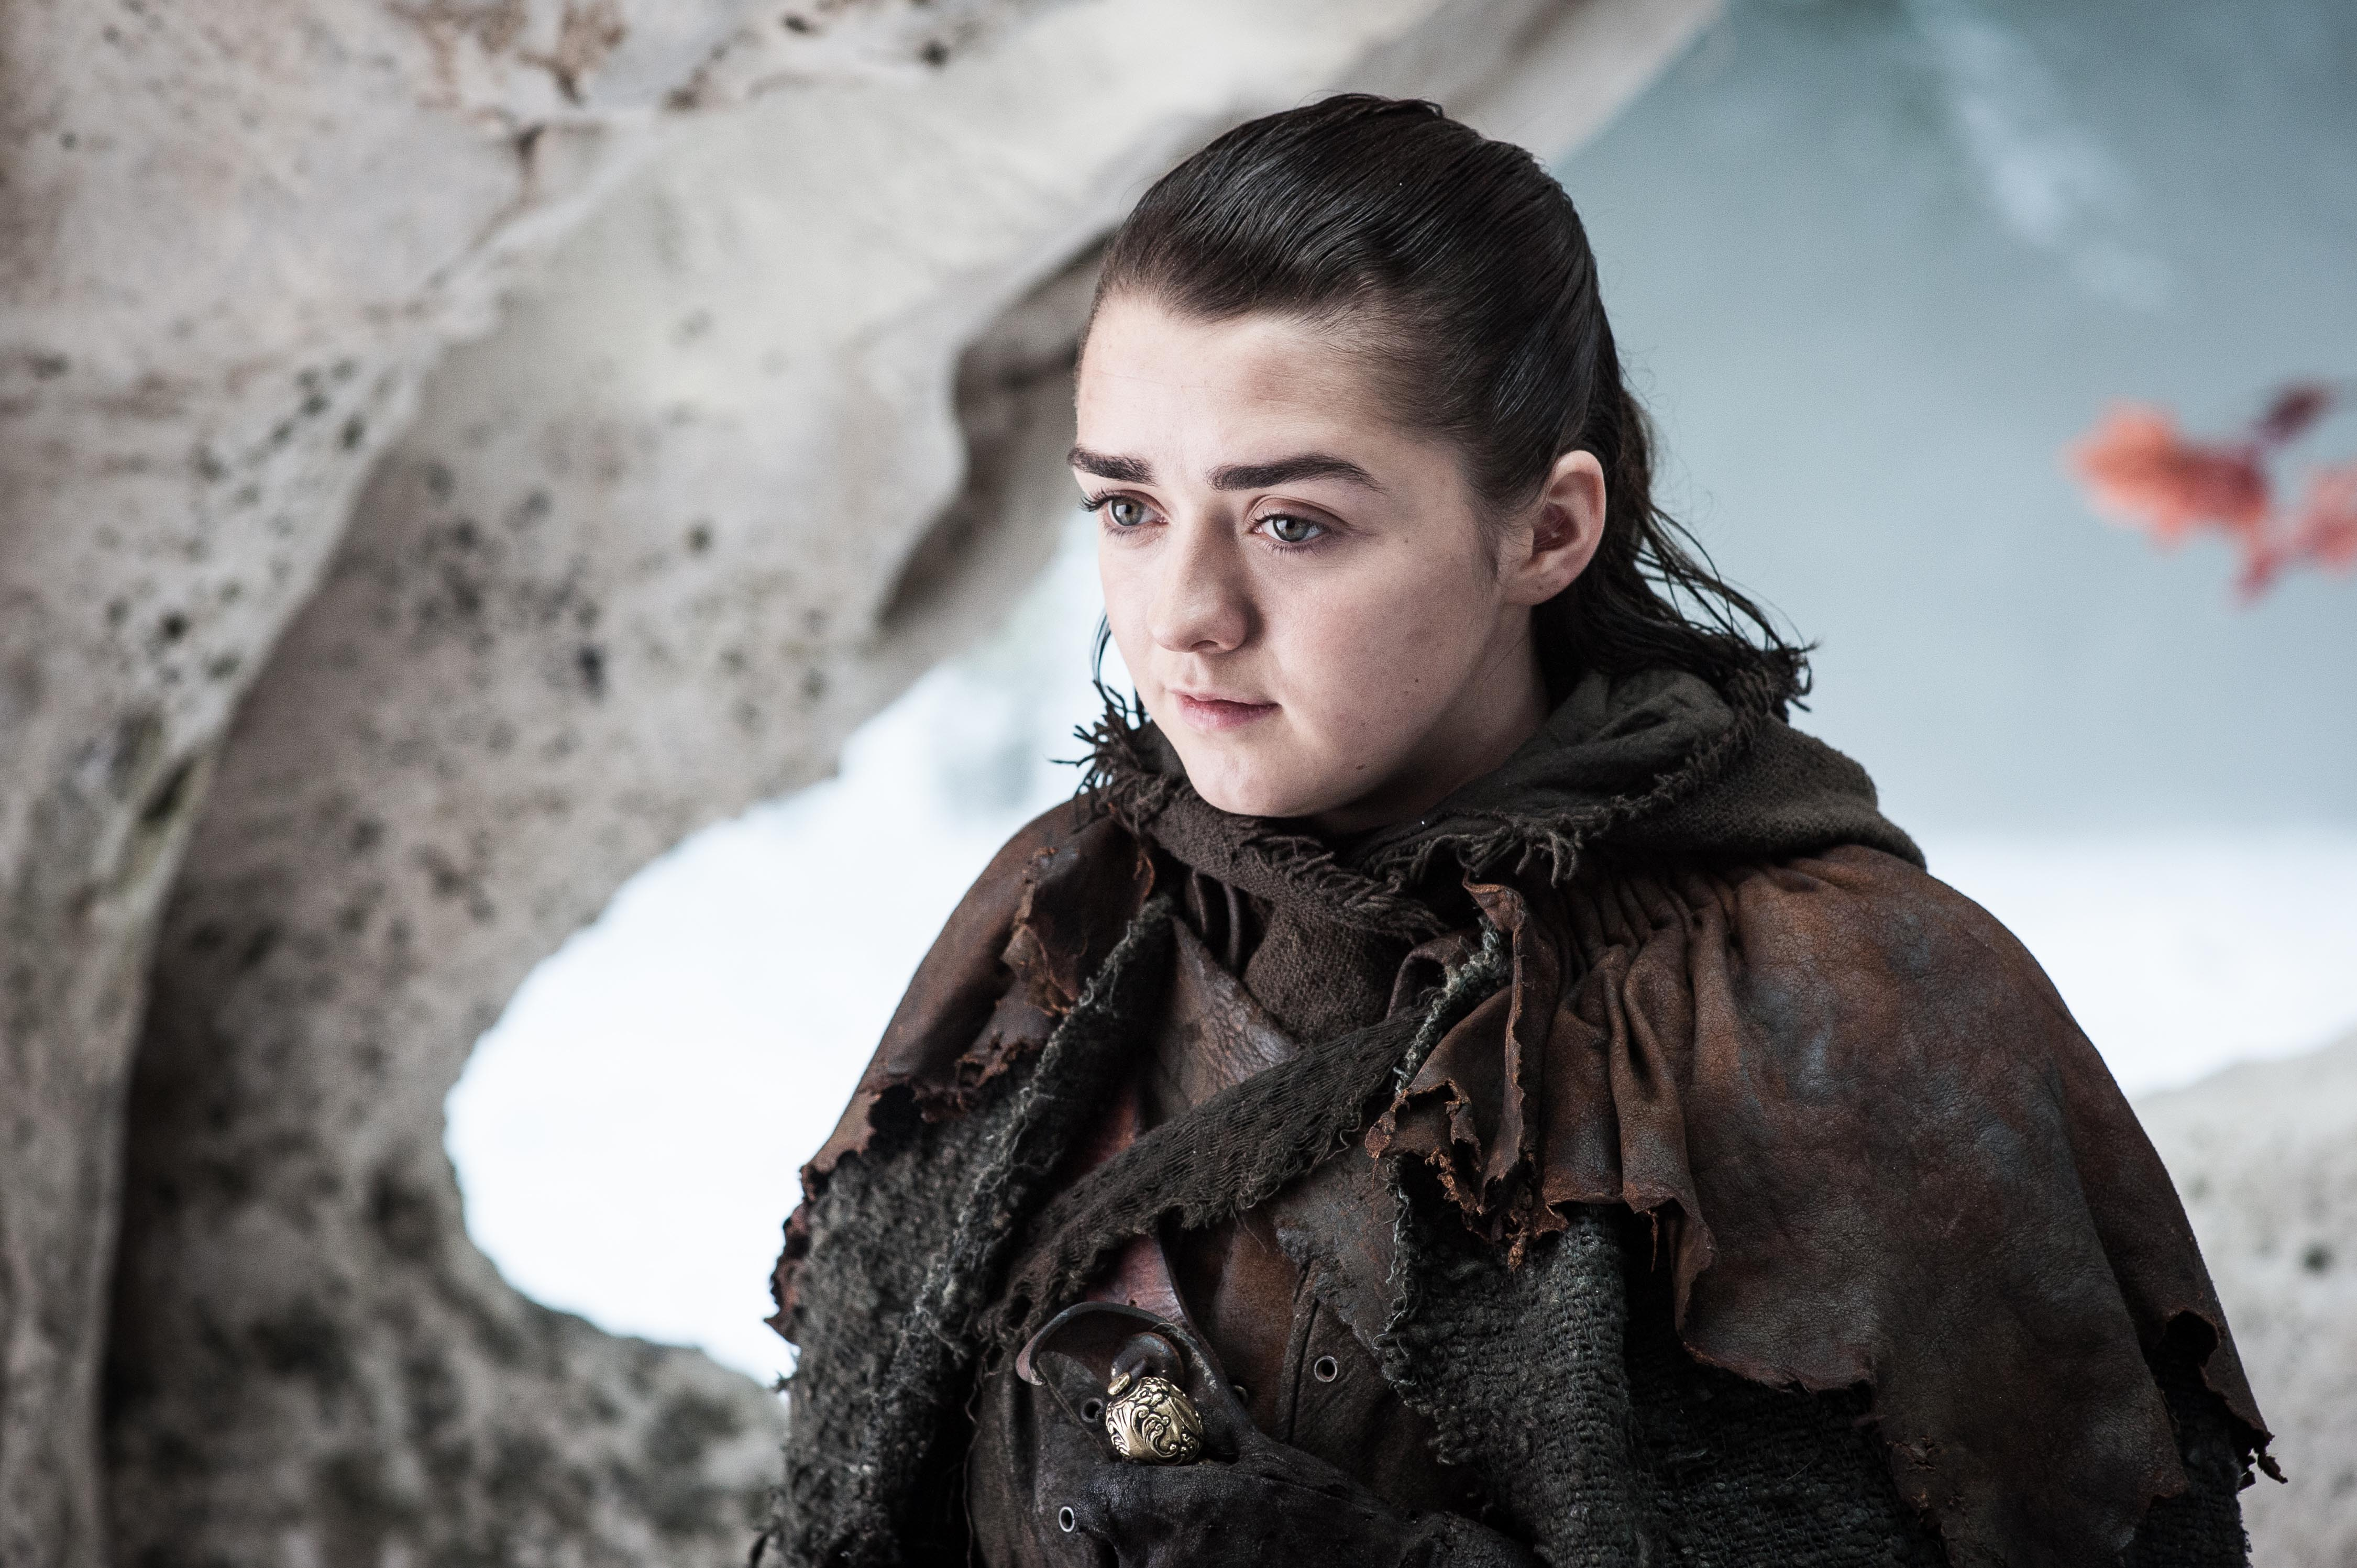 Arya Stark 7x04 - The Spoils of War